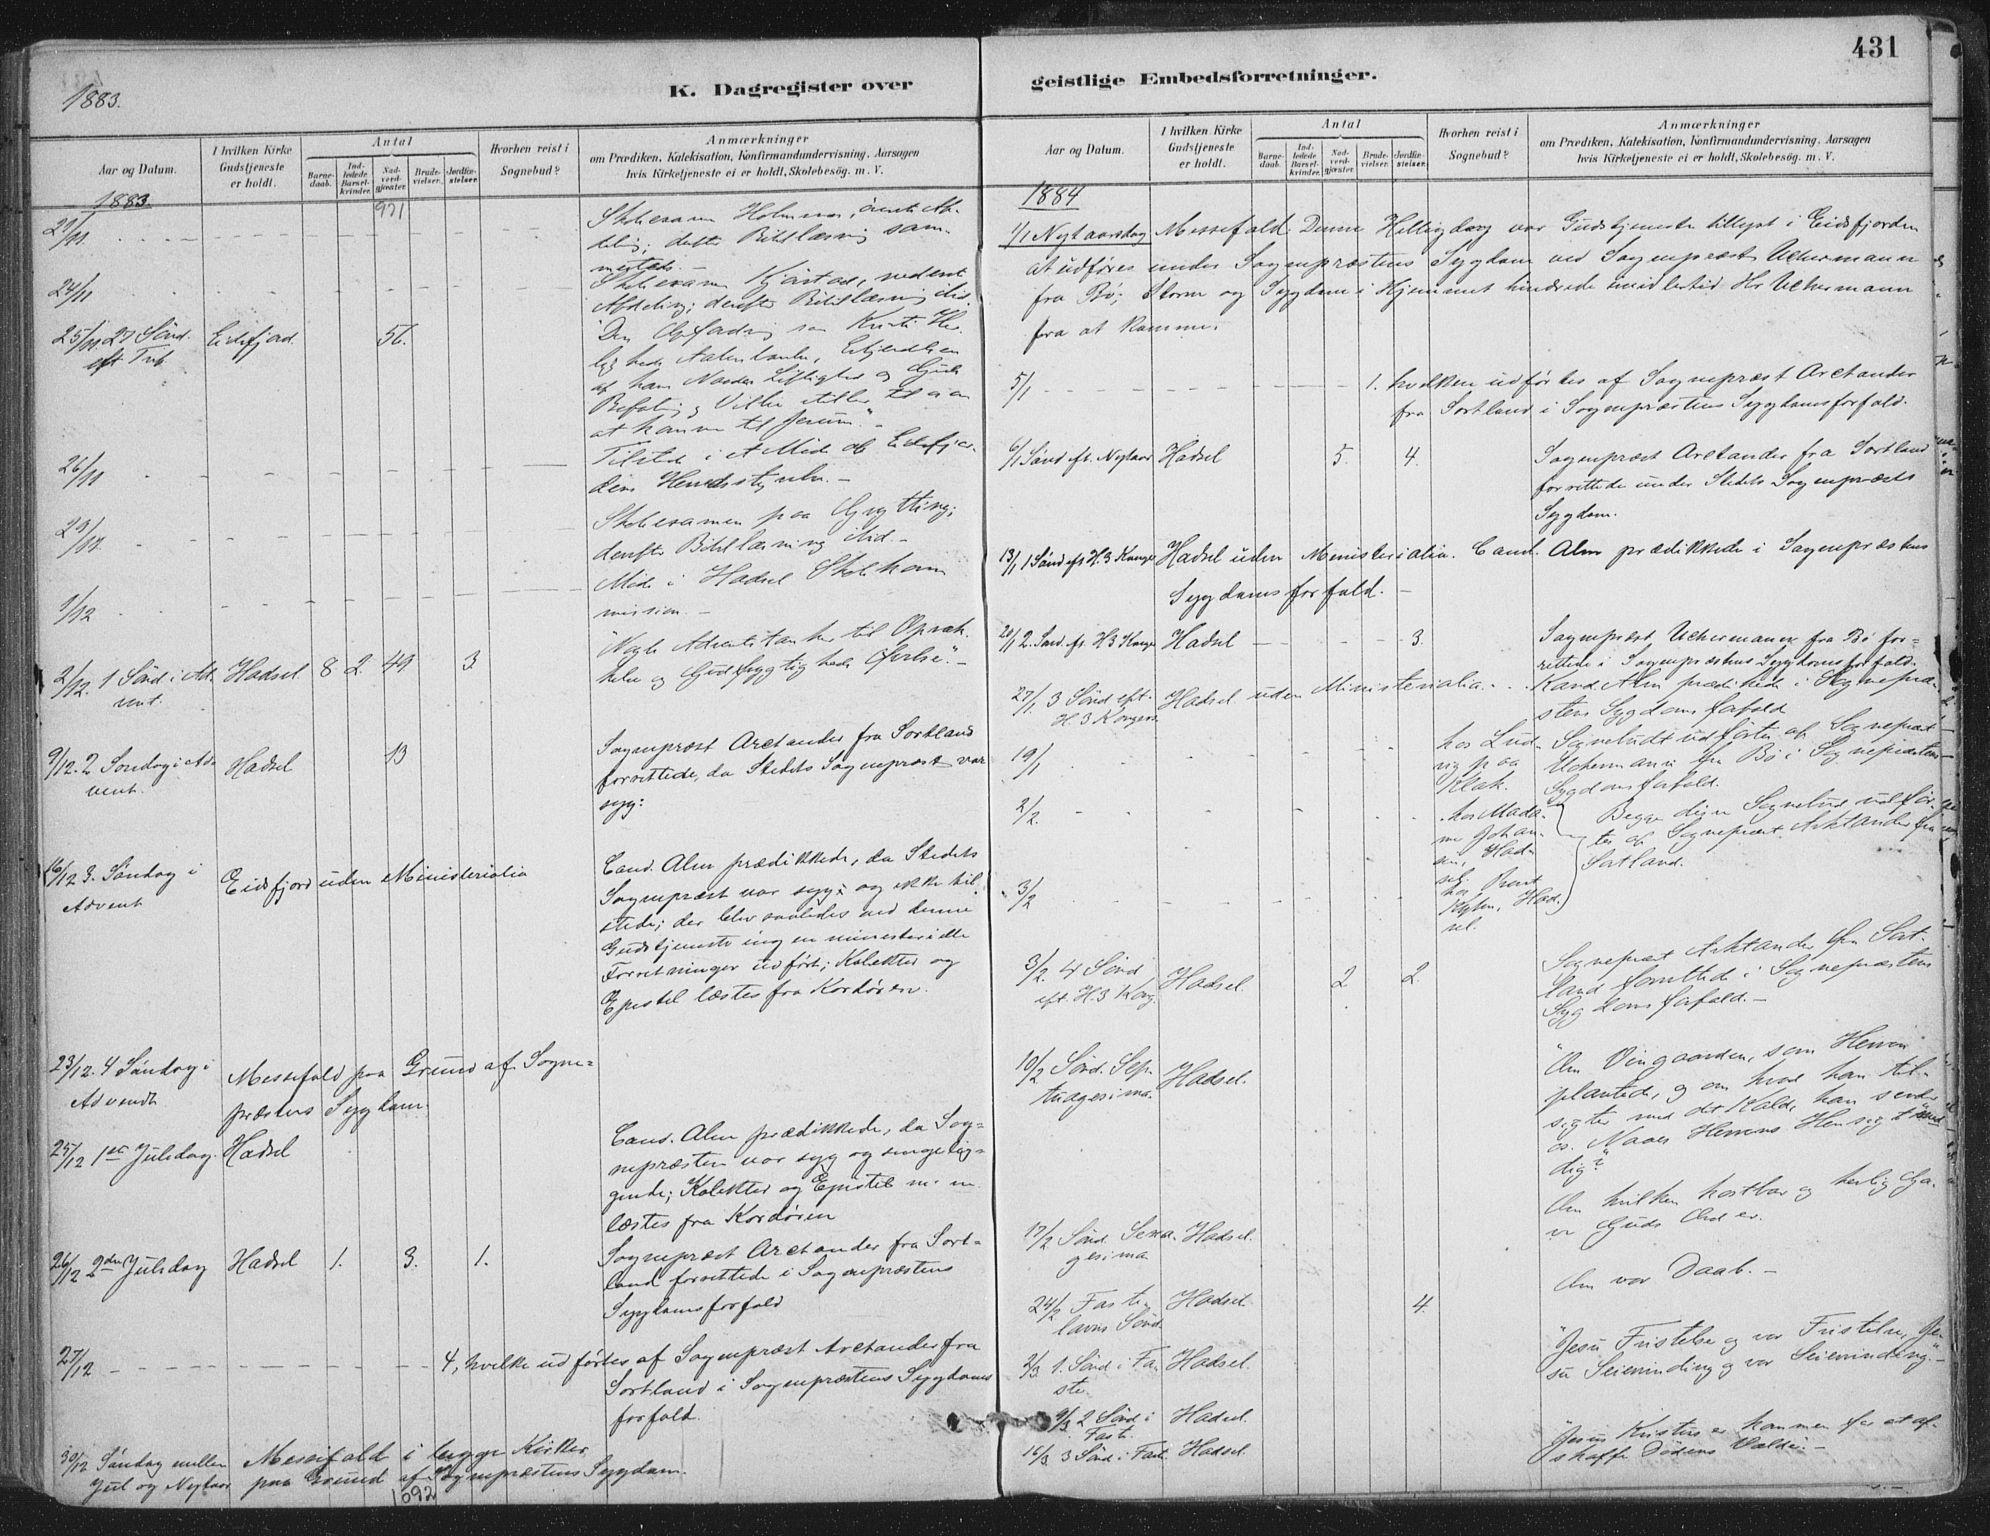 SAT, Ministerialprotokoller, klokkerbøker og fødselsregistre - Nordland, 888/L1244: Ministerialbok nr. 888A10, 1880-1890, s. 431